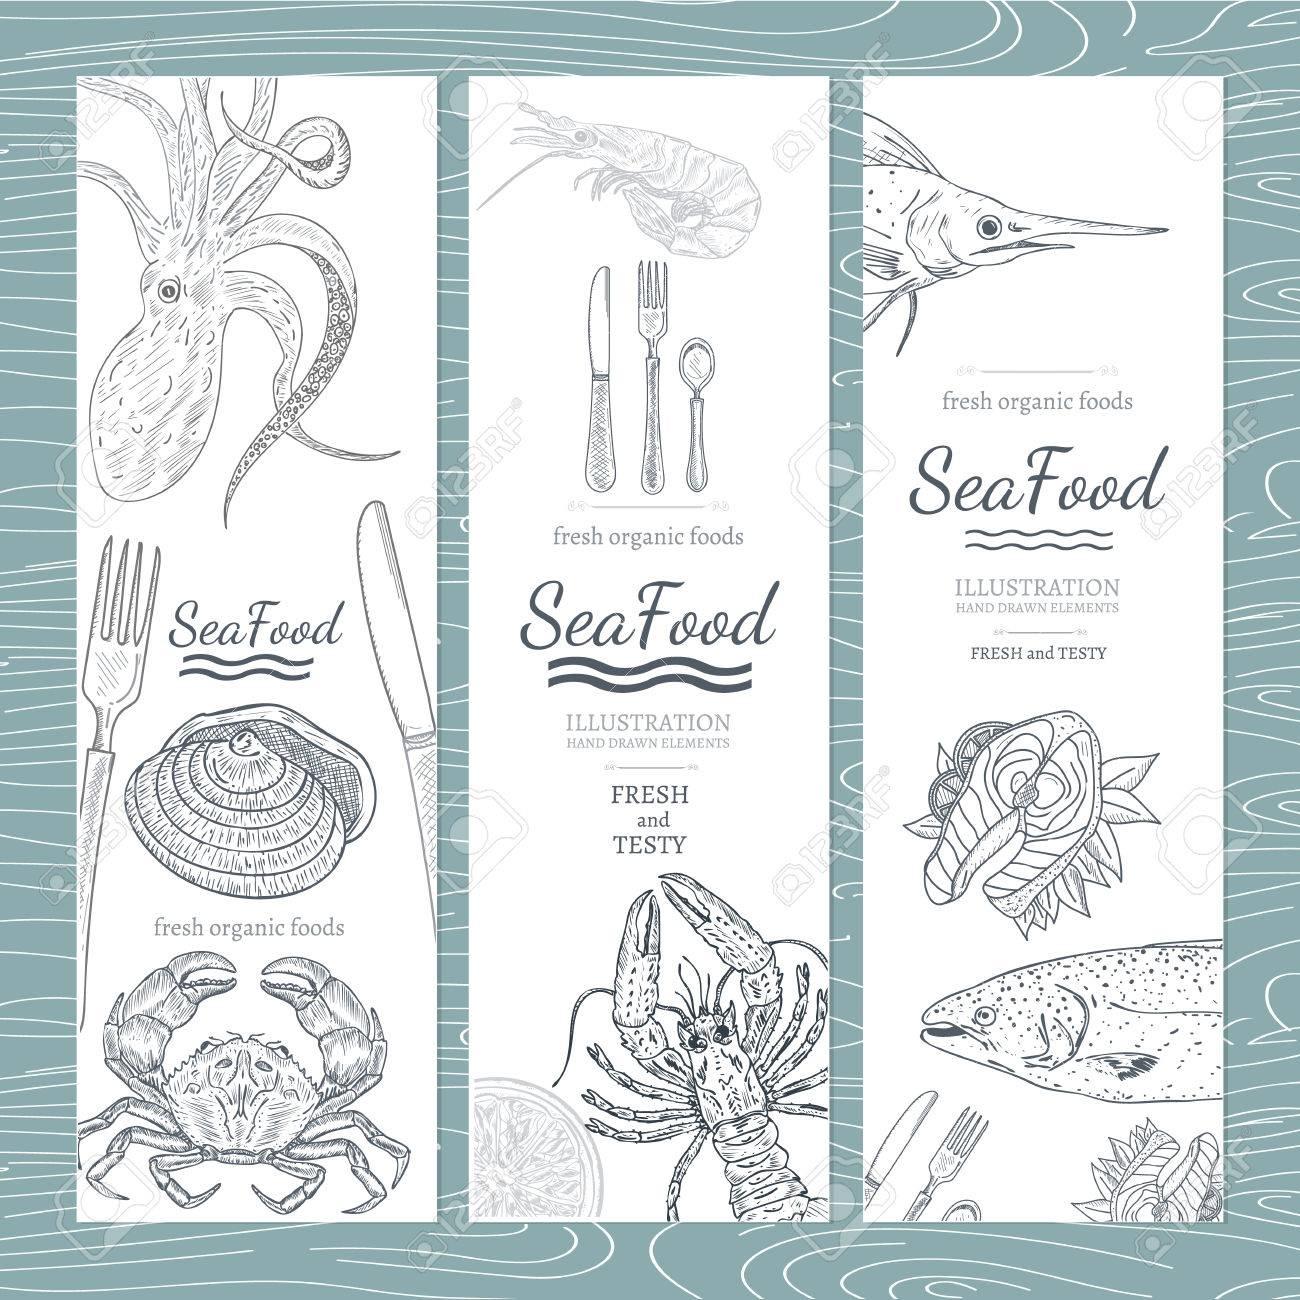 Sea food banner hand drawn vector - 55822417